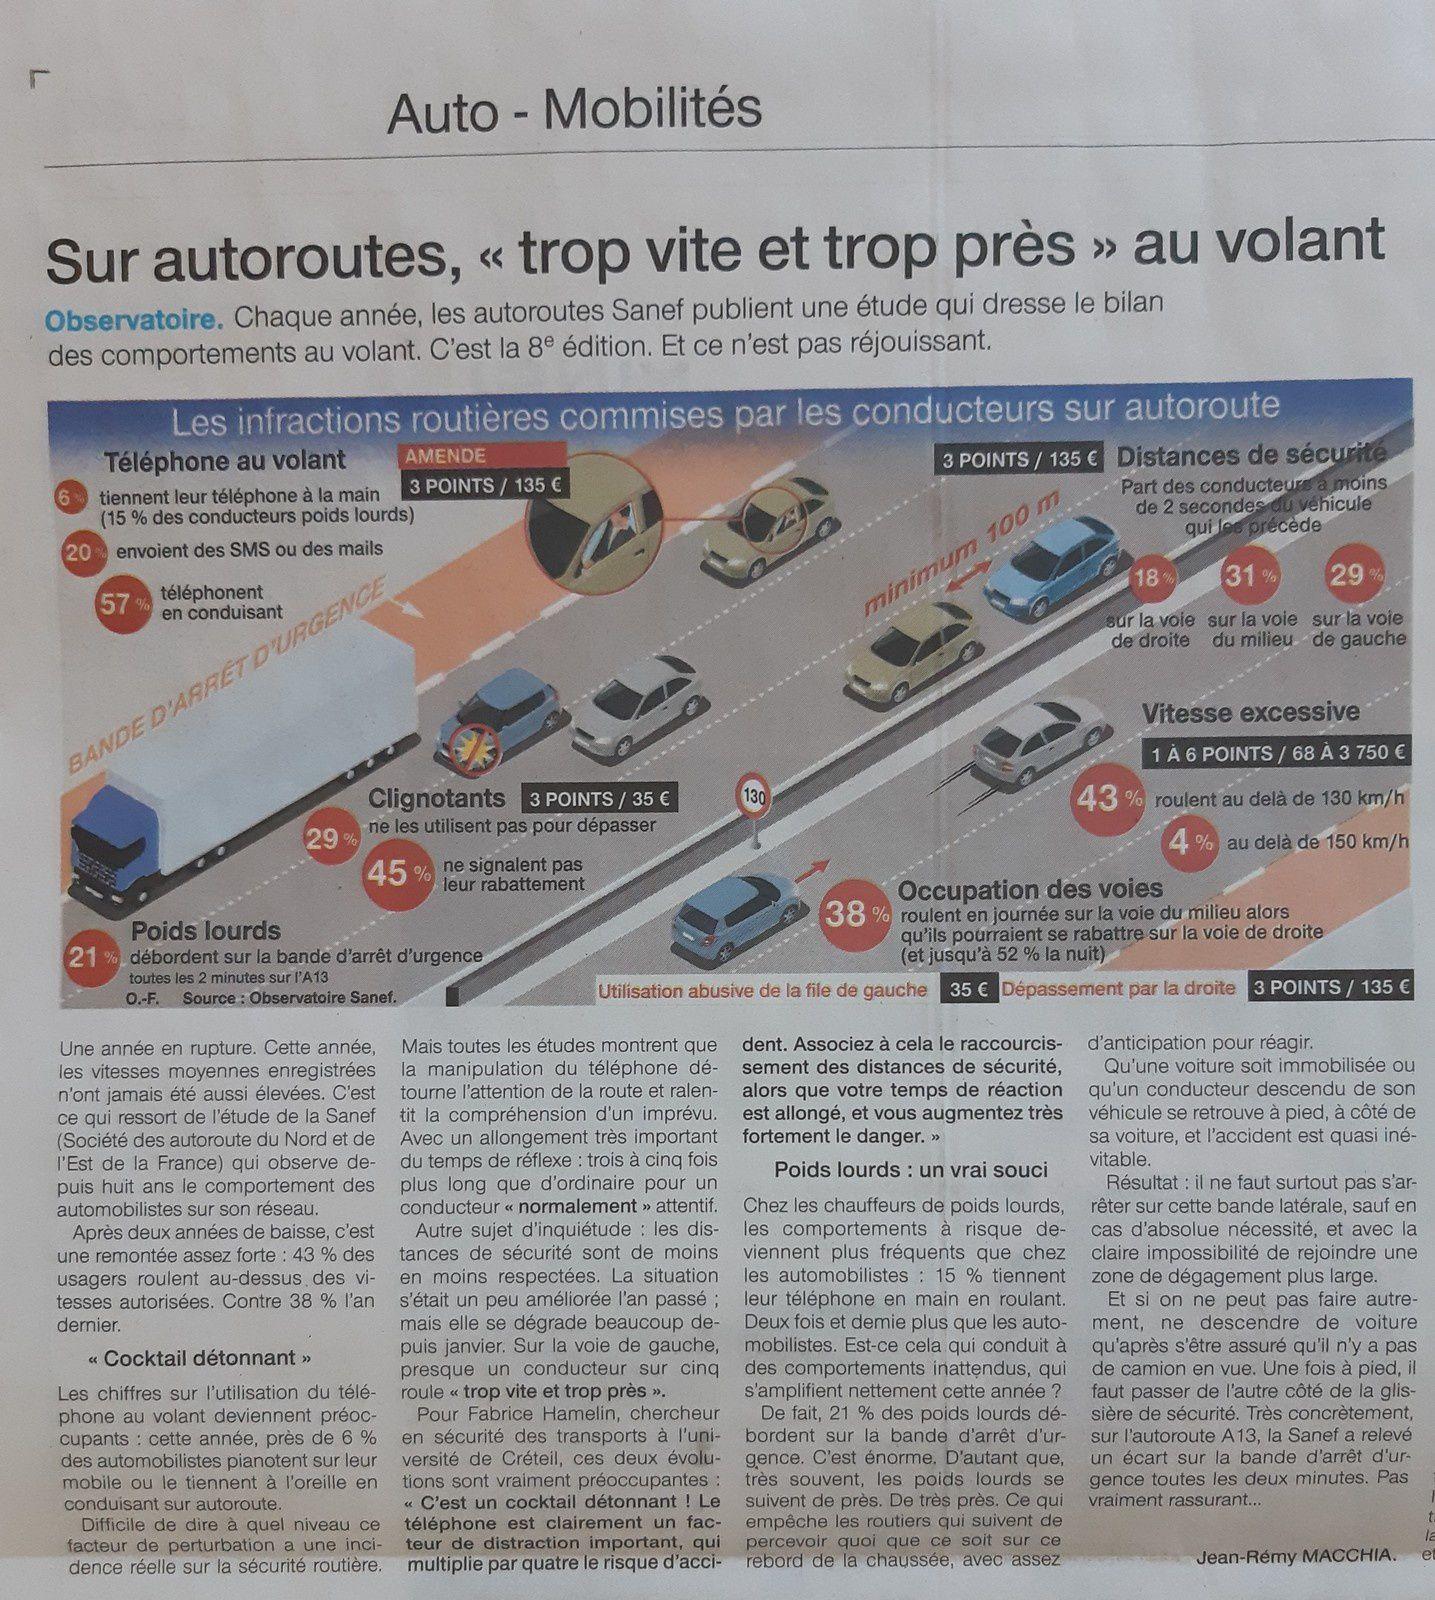 artice ouest france 04/07/2019